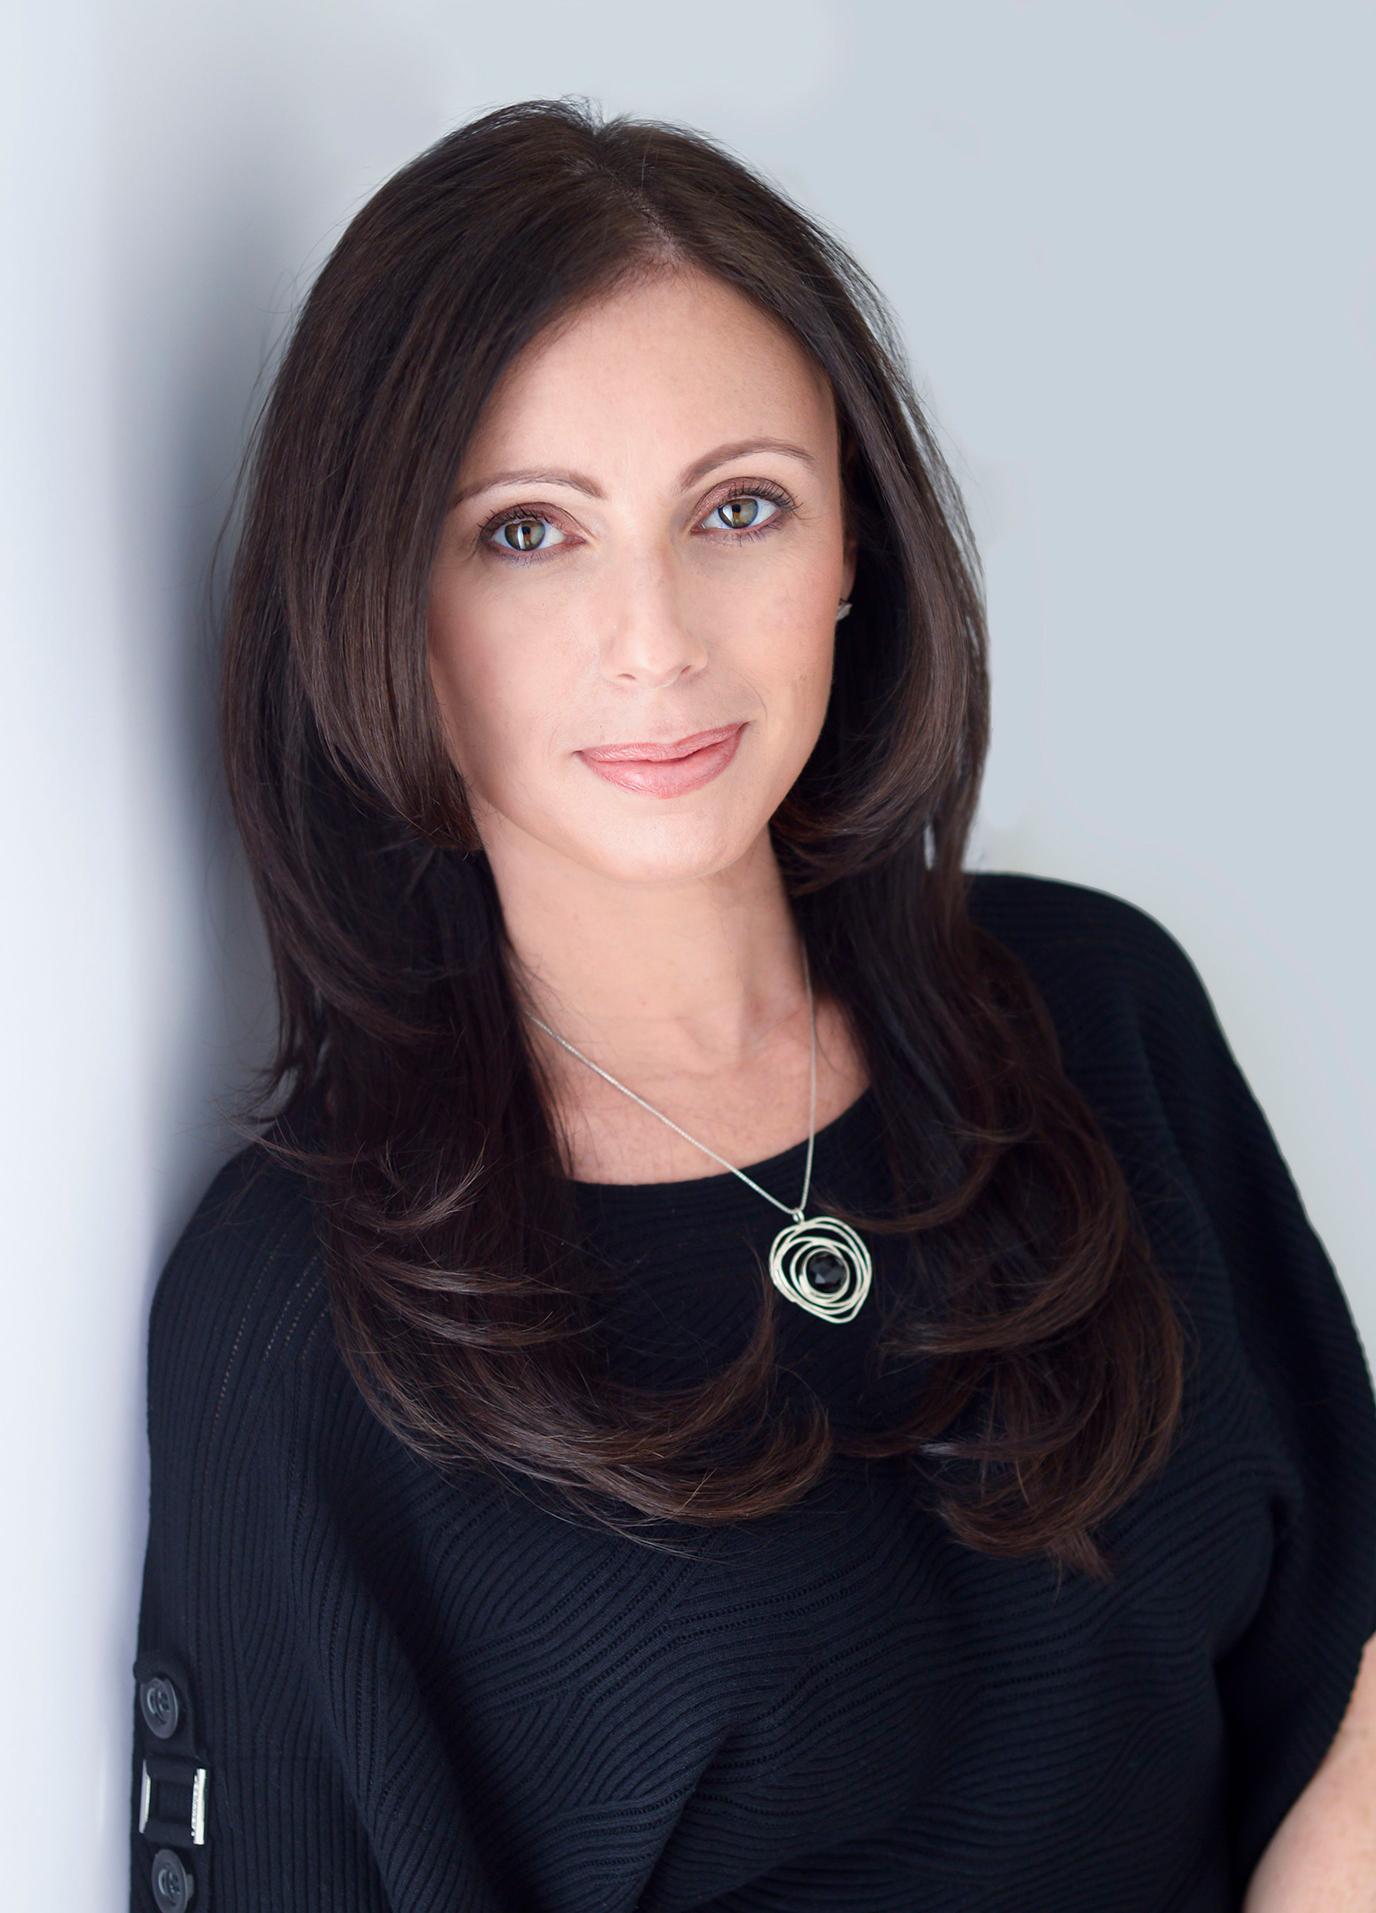 Dr. Suzy Weidenfelder